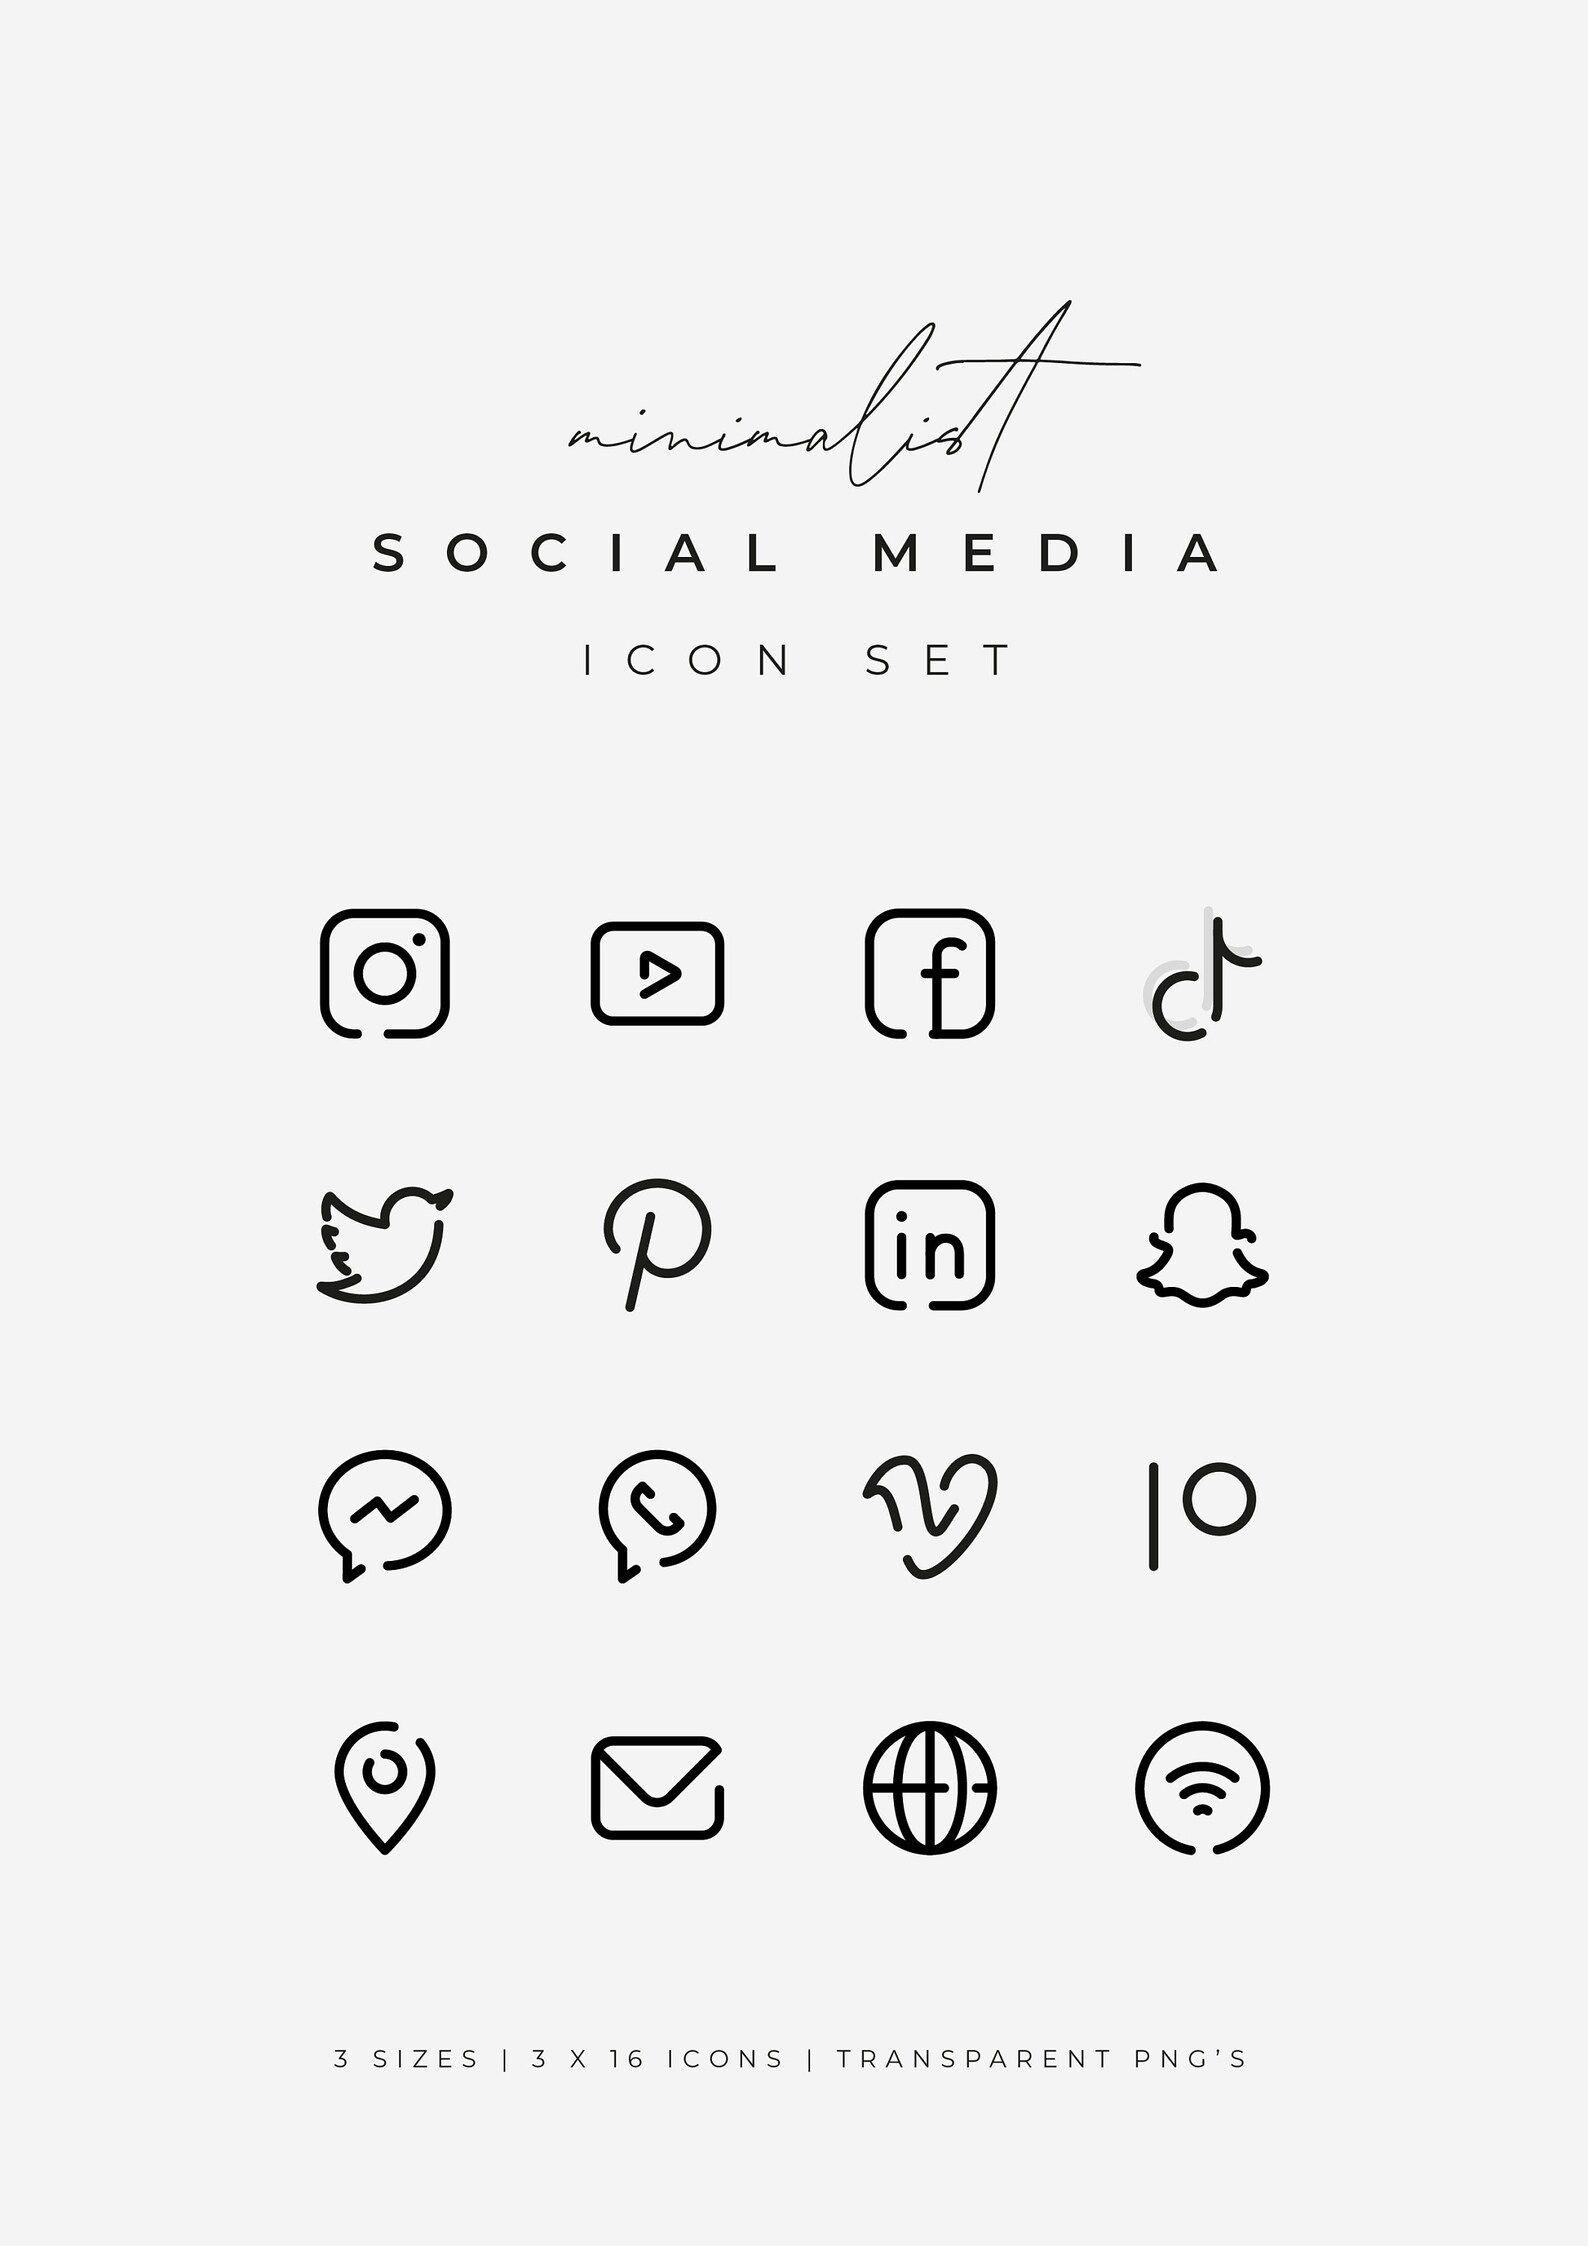 Black Social Media Icons Minimalist Social Media Logos Simple Line Icons Instagram Youtube Facebook Tiktok Patreon Etc By Senti Social Media Icons Black Social Media Icons Media Icon